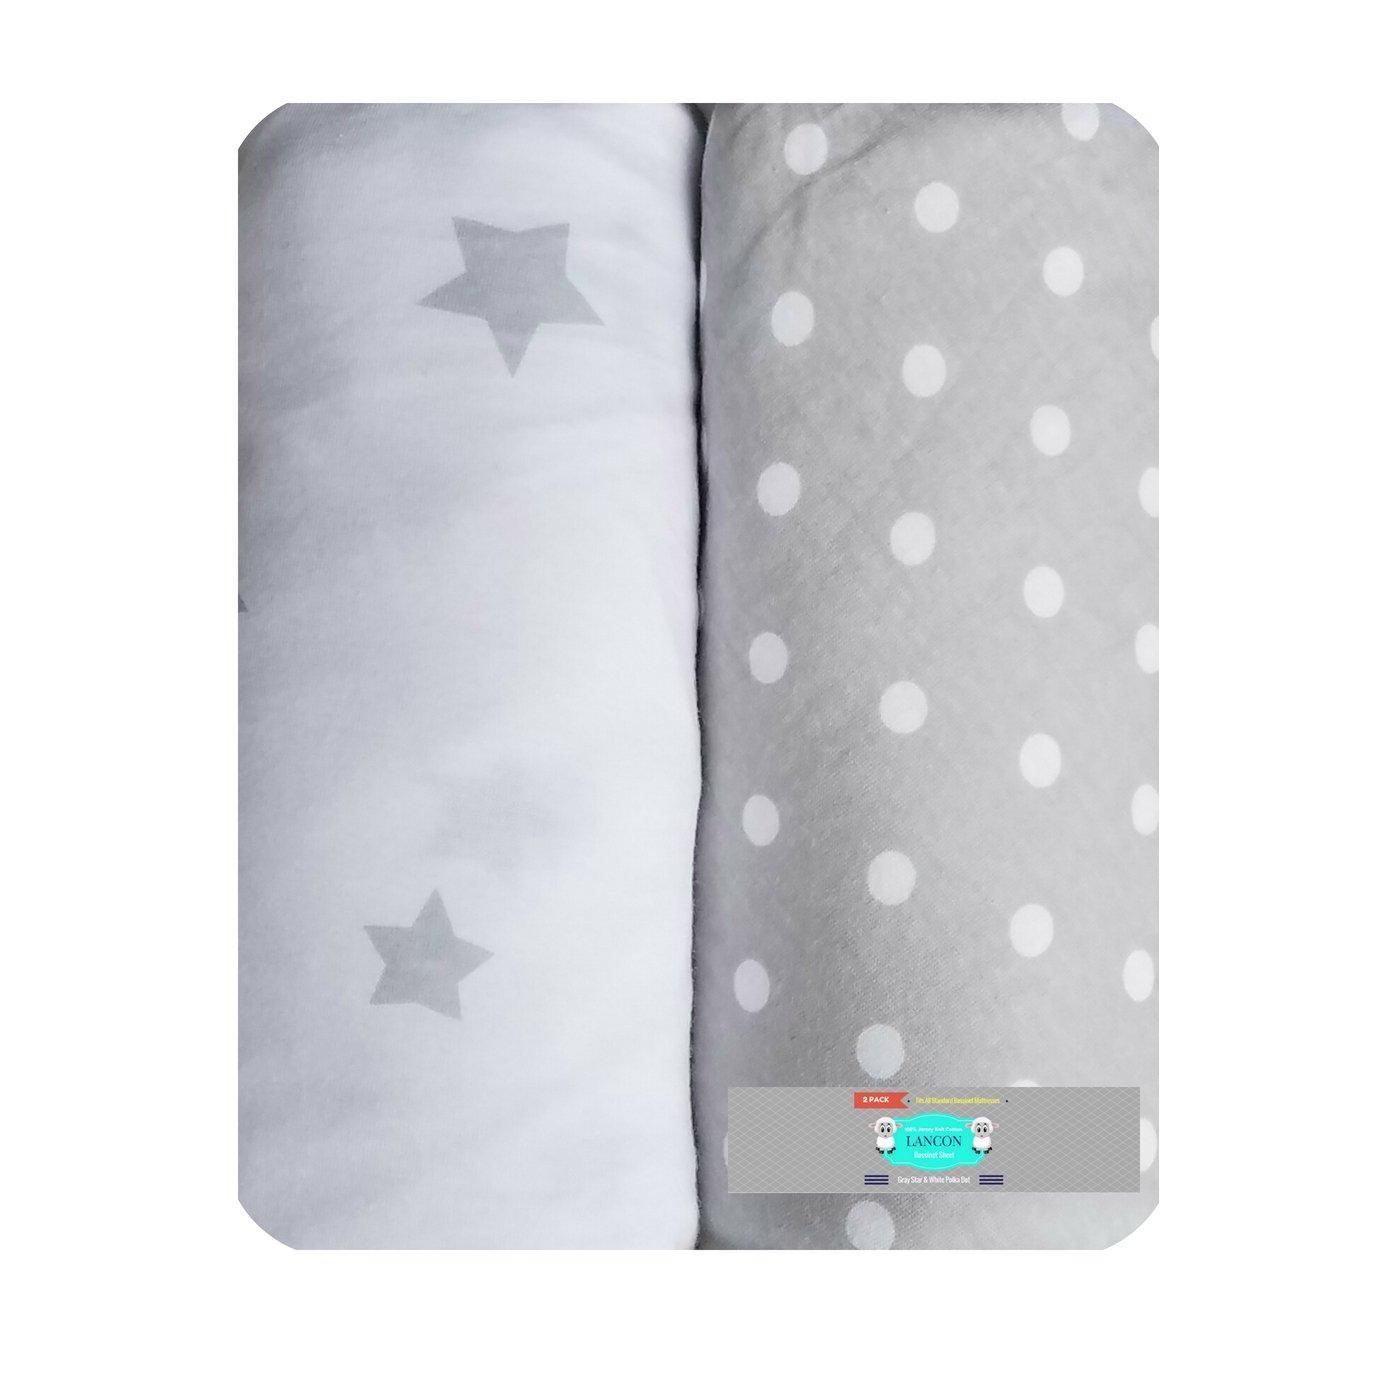 Bassinet Sheet Set by LANCON Kids - 2 Pack 100% Jersey Knit Cotton (Gray Star & White Polka Dot)